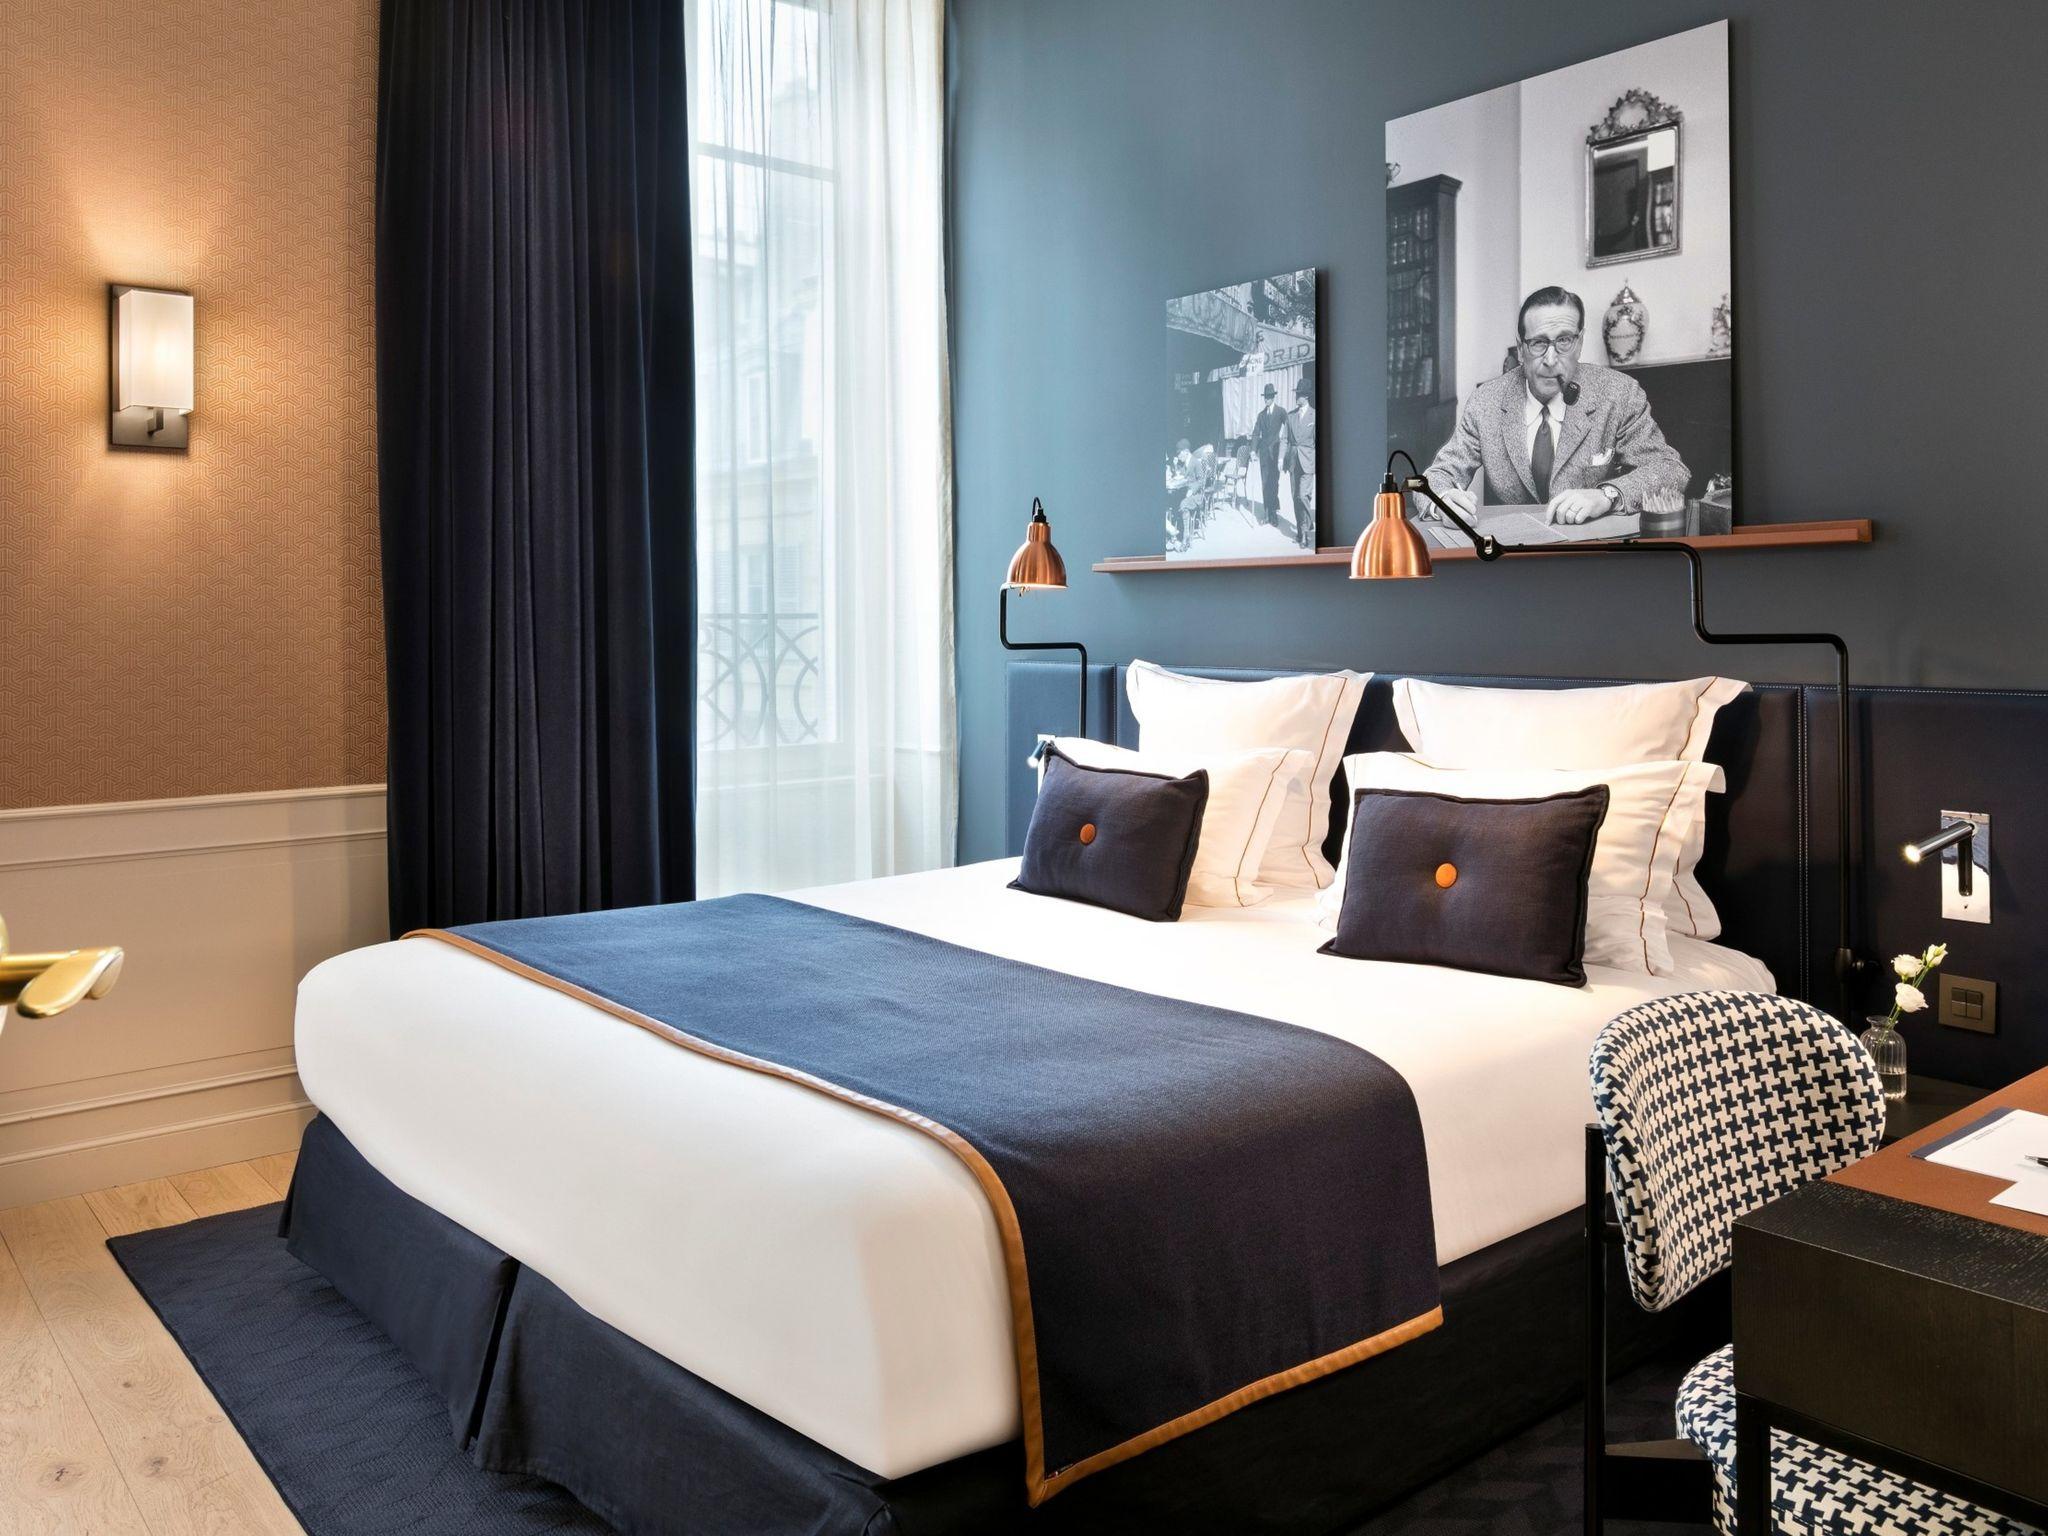 hotel in paris hotel square louvois. Black Bedroom Furniture Sets. Home Design Ideas